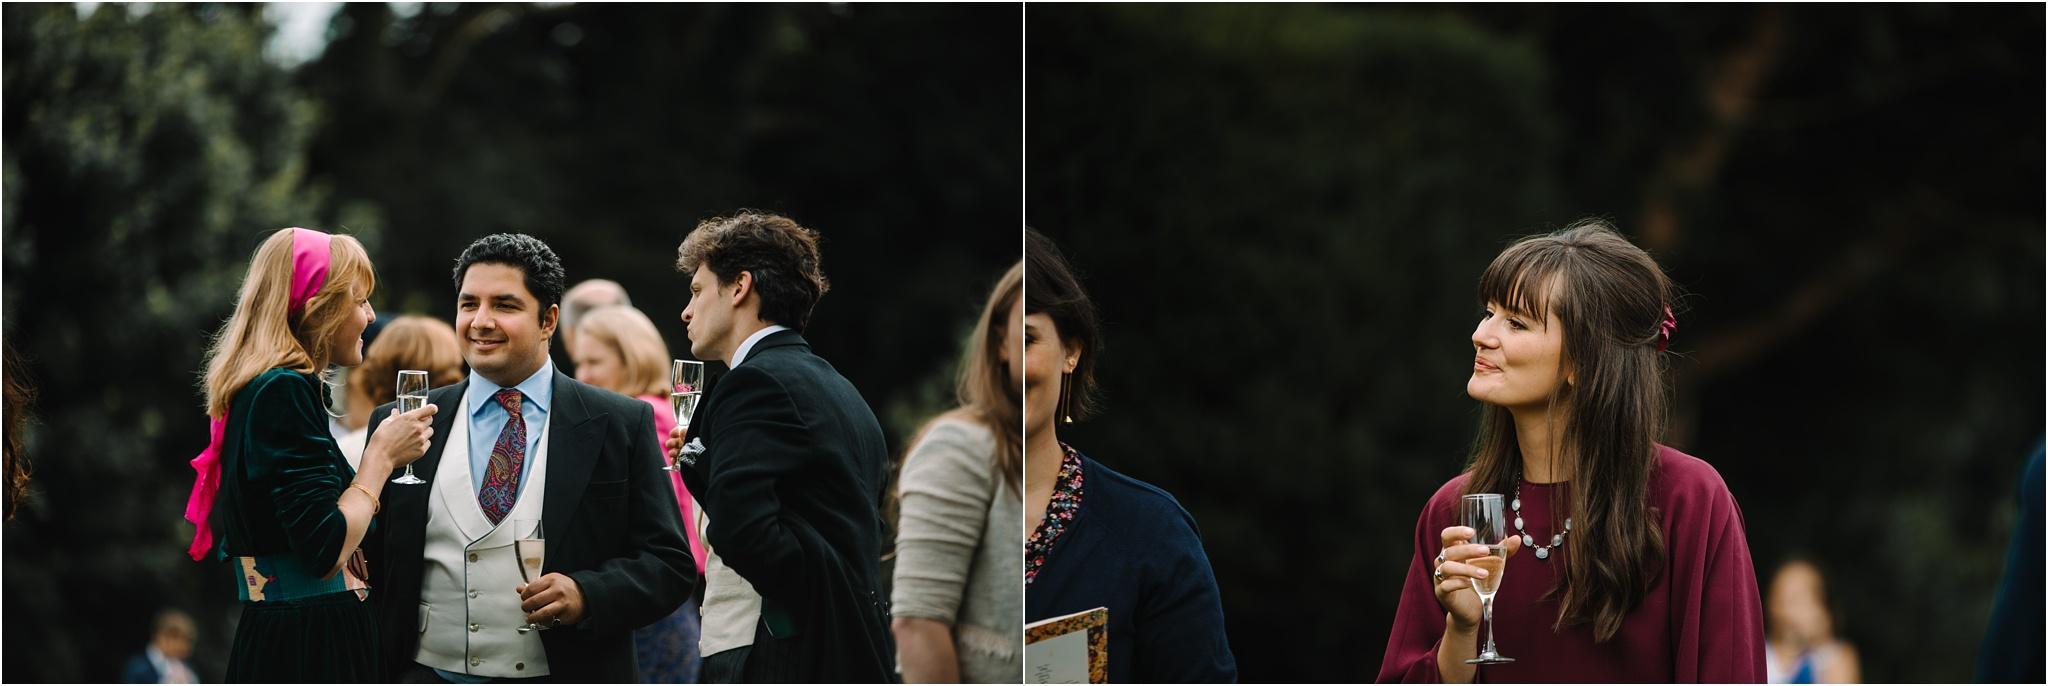 Outdoor-country-wedding-Edinburgh-photographer__0047.jpg